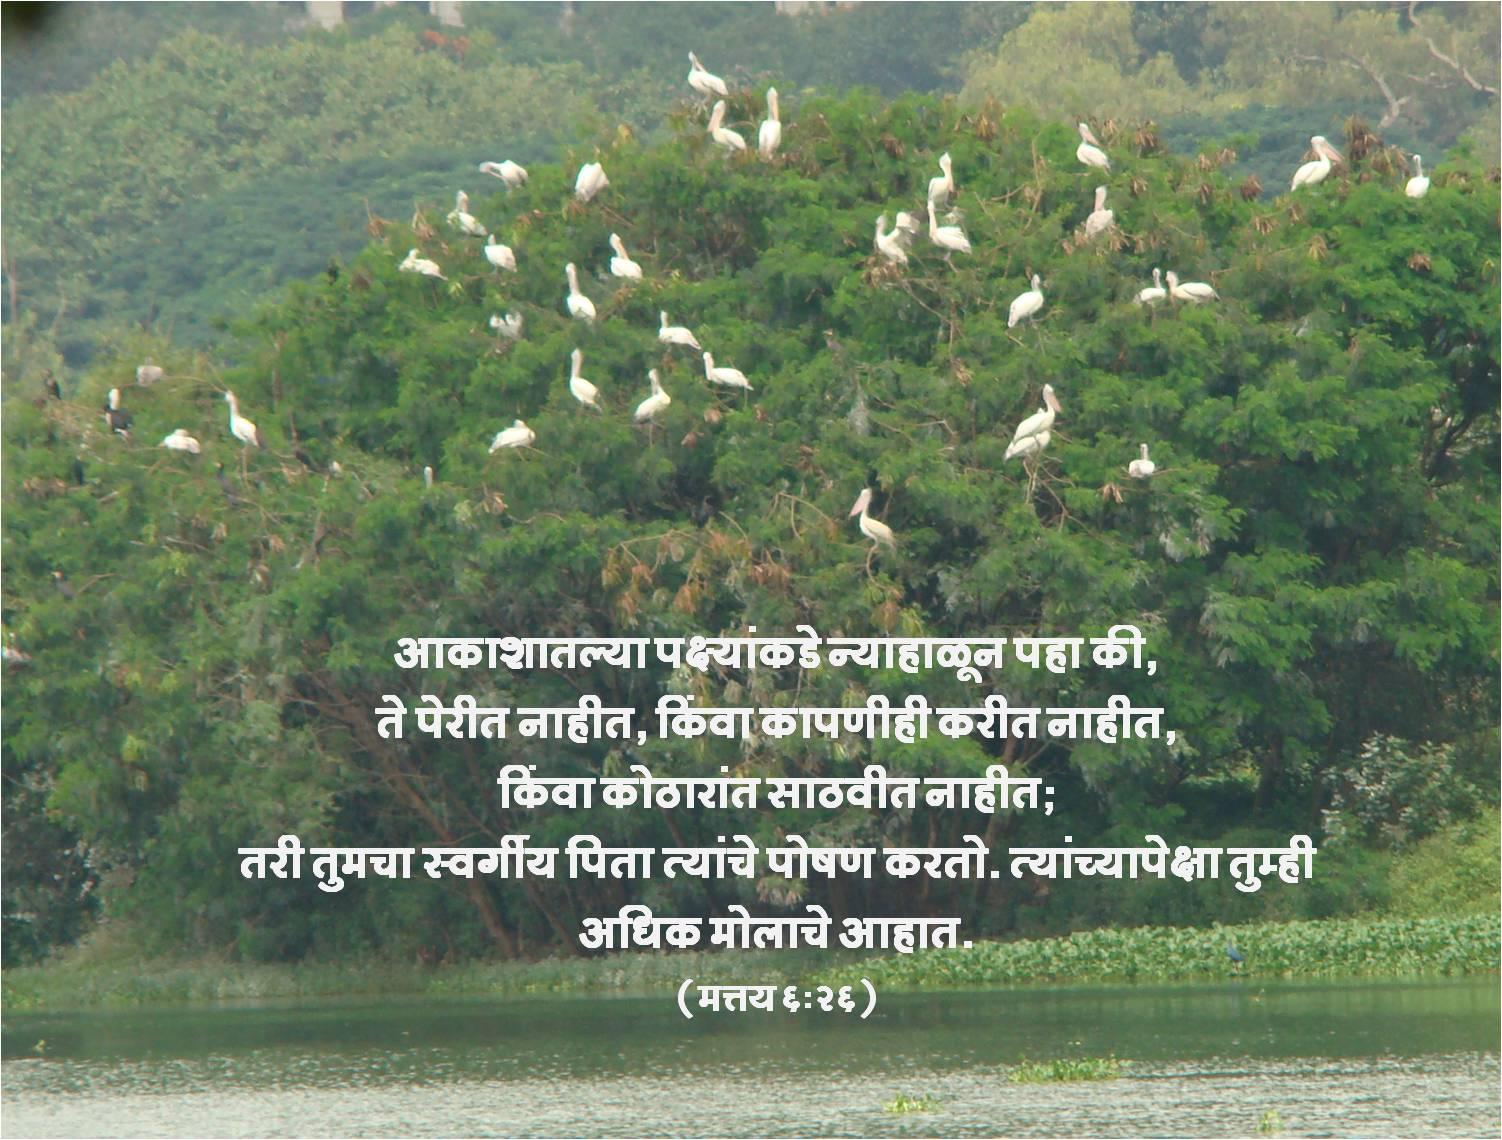 marathi bible wallpaper for - photo #24